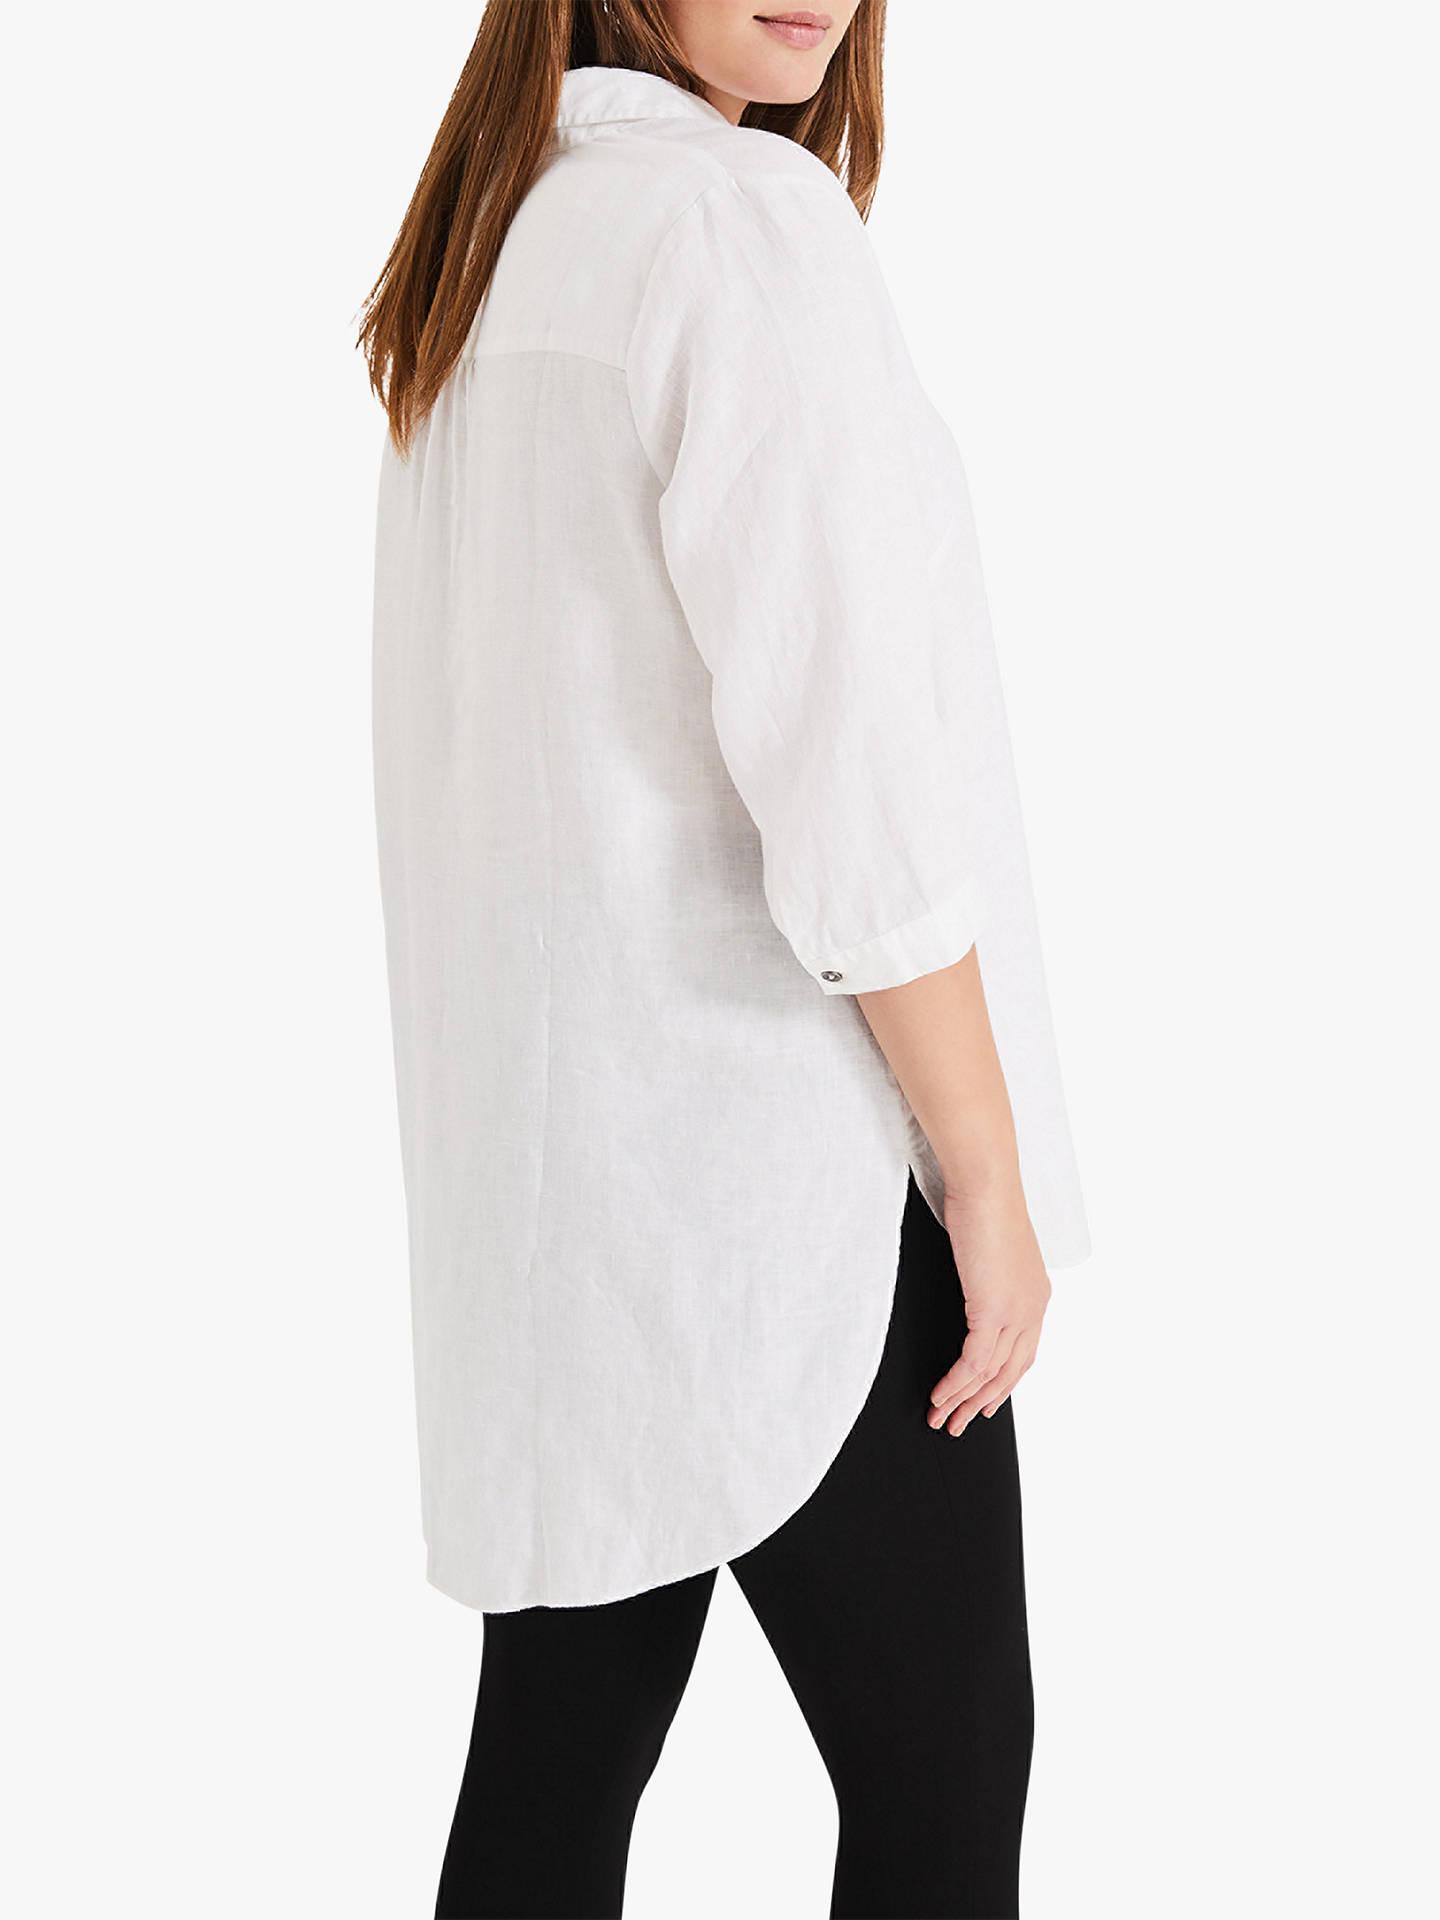 4332cff2 ... Buy Studio 8 Haze Linen Shirt, White, 16 Online at johnlewis.com ...